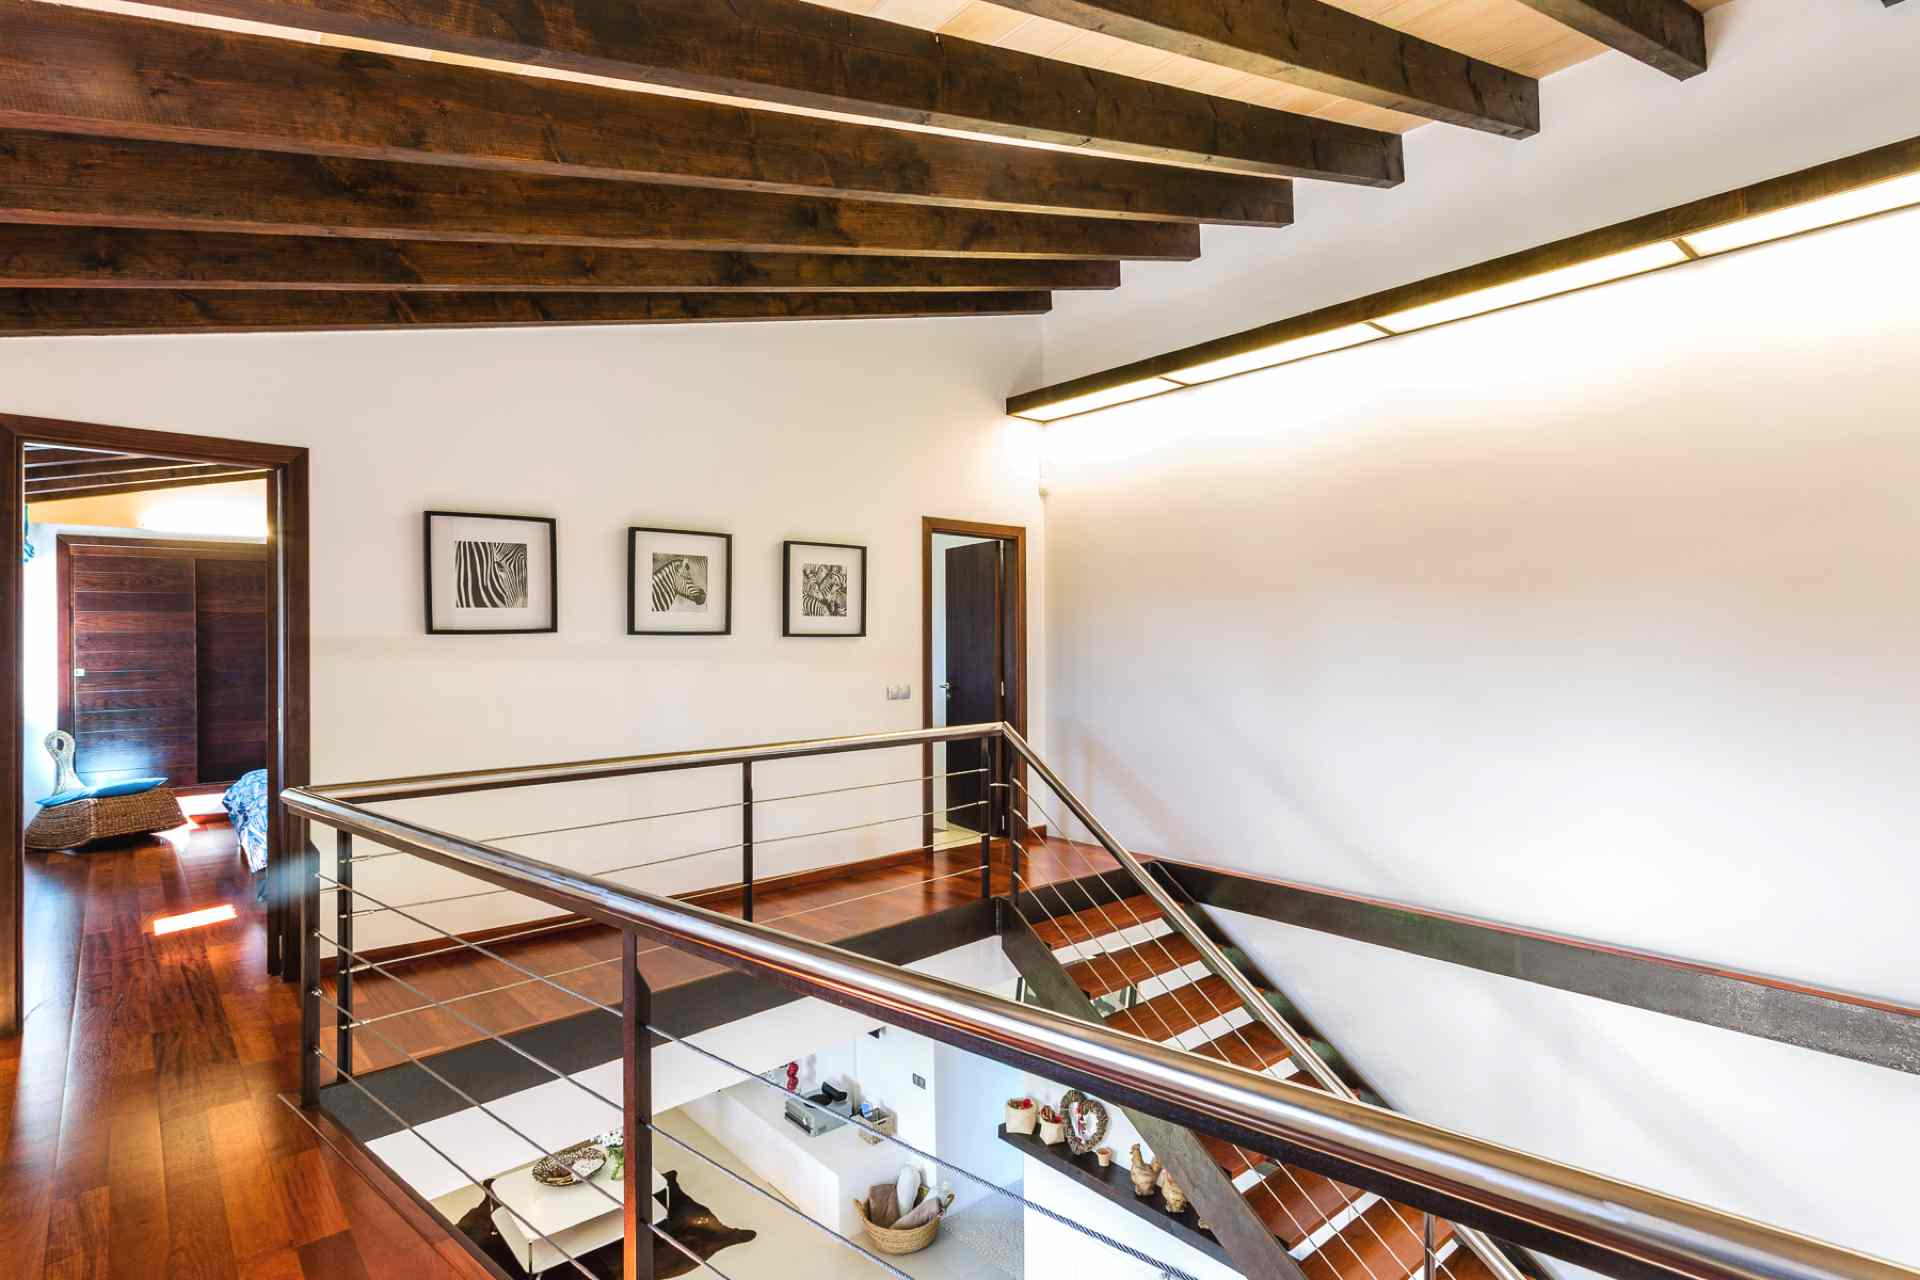 01-53 Moderne Finca Mallorca Nordosten Bild 27